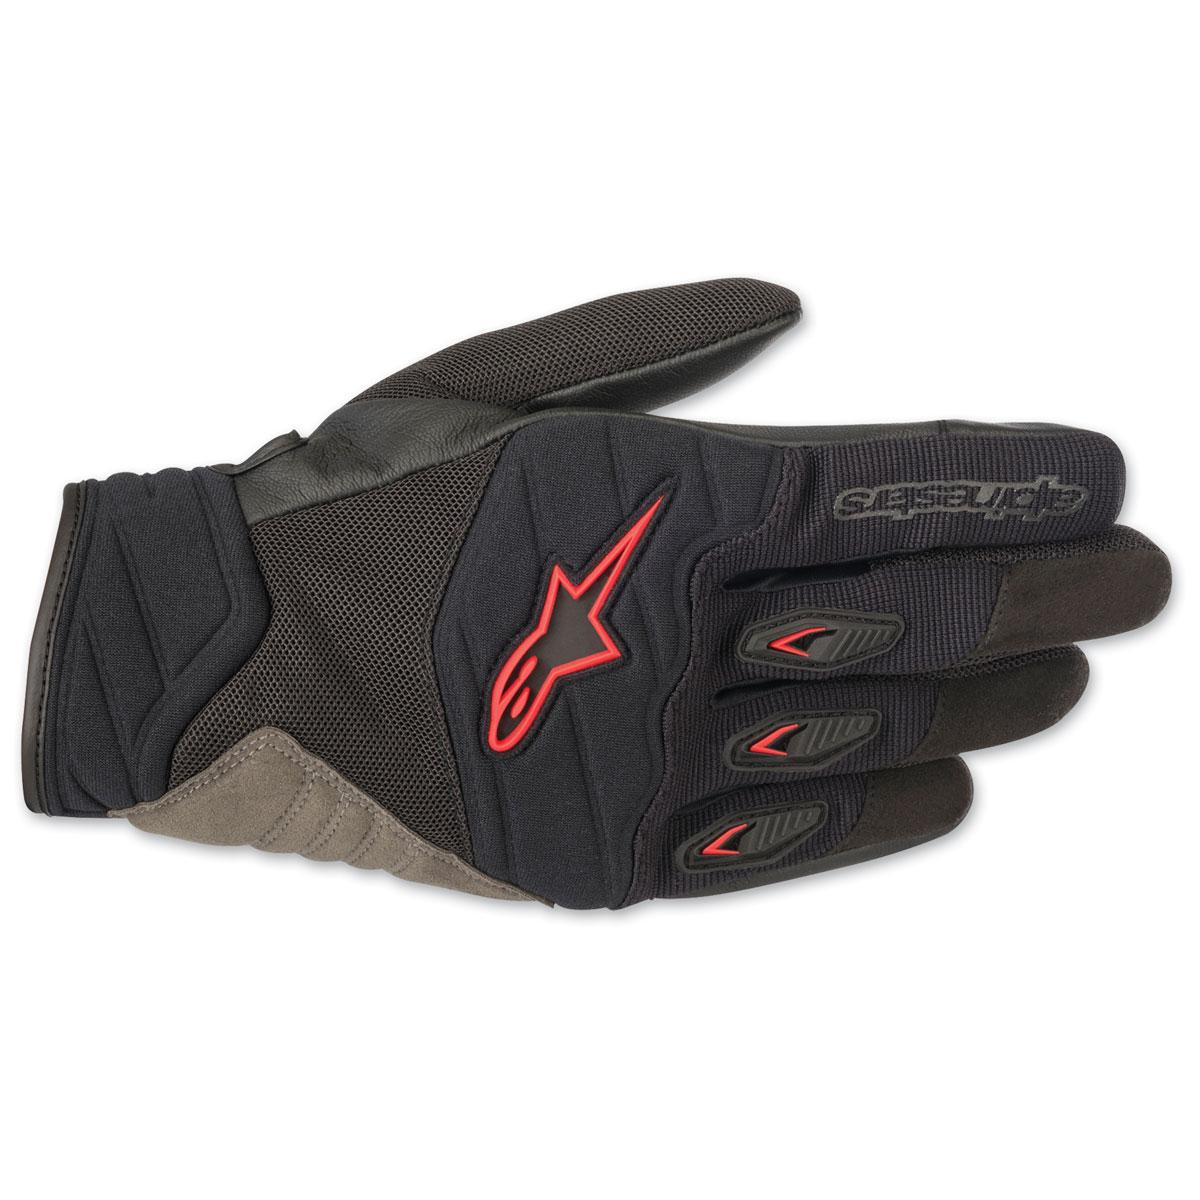 Alpinestars Men's Shore Black/Red Gloves